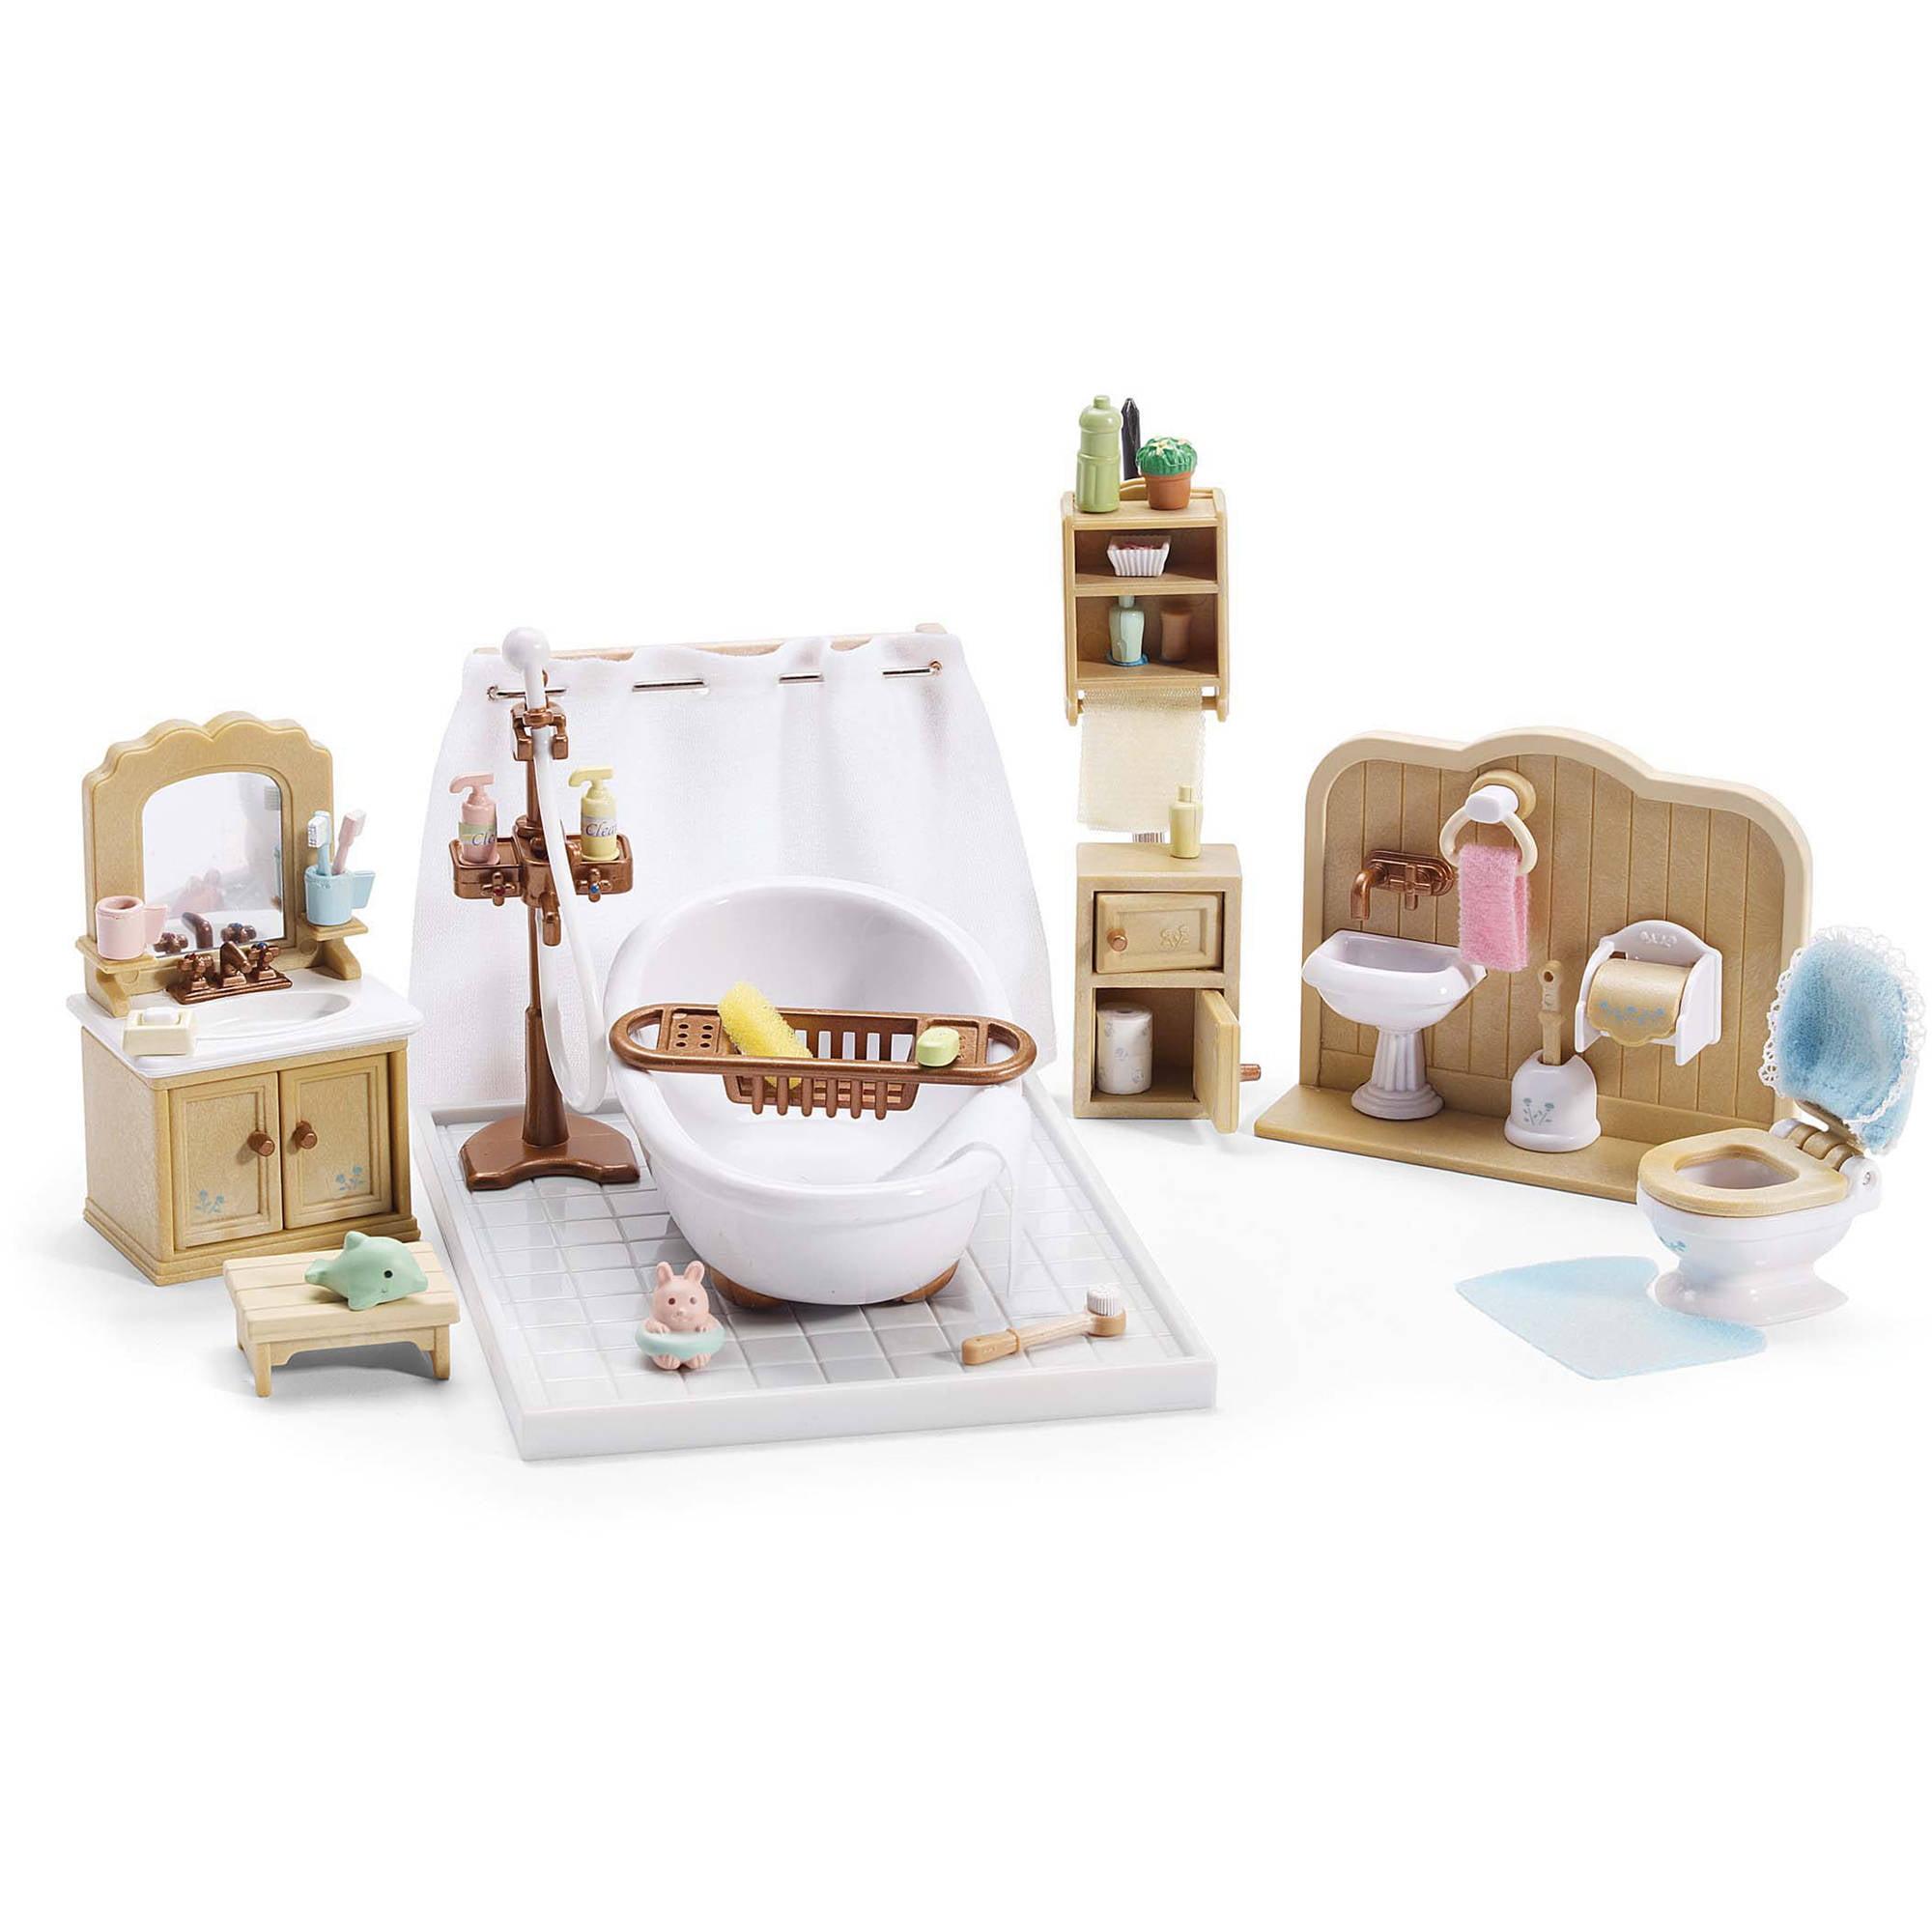 Calico Critters Deluxe Bathroom Set